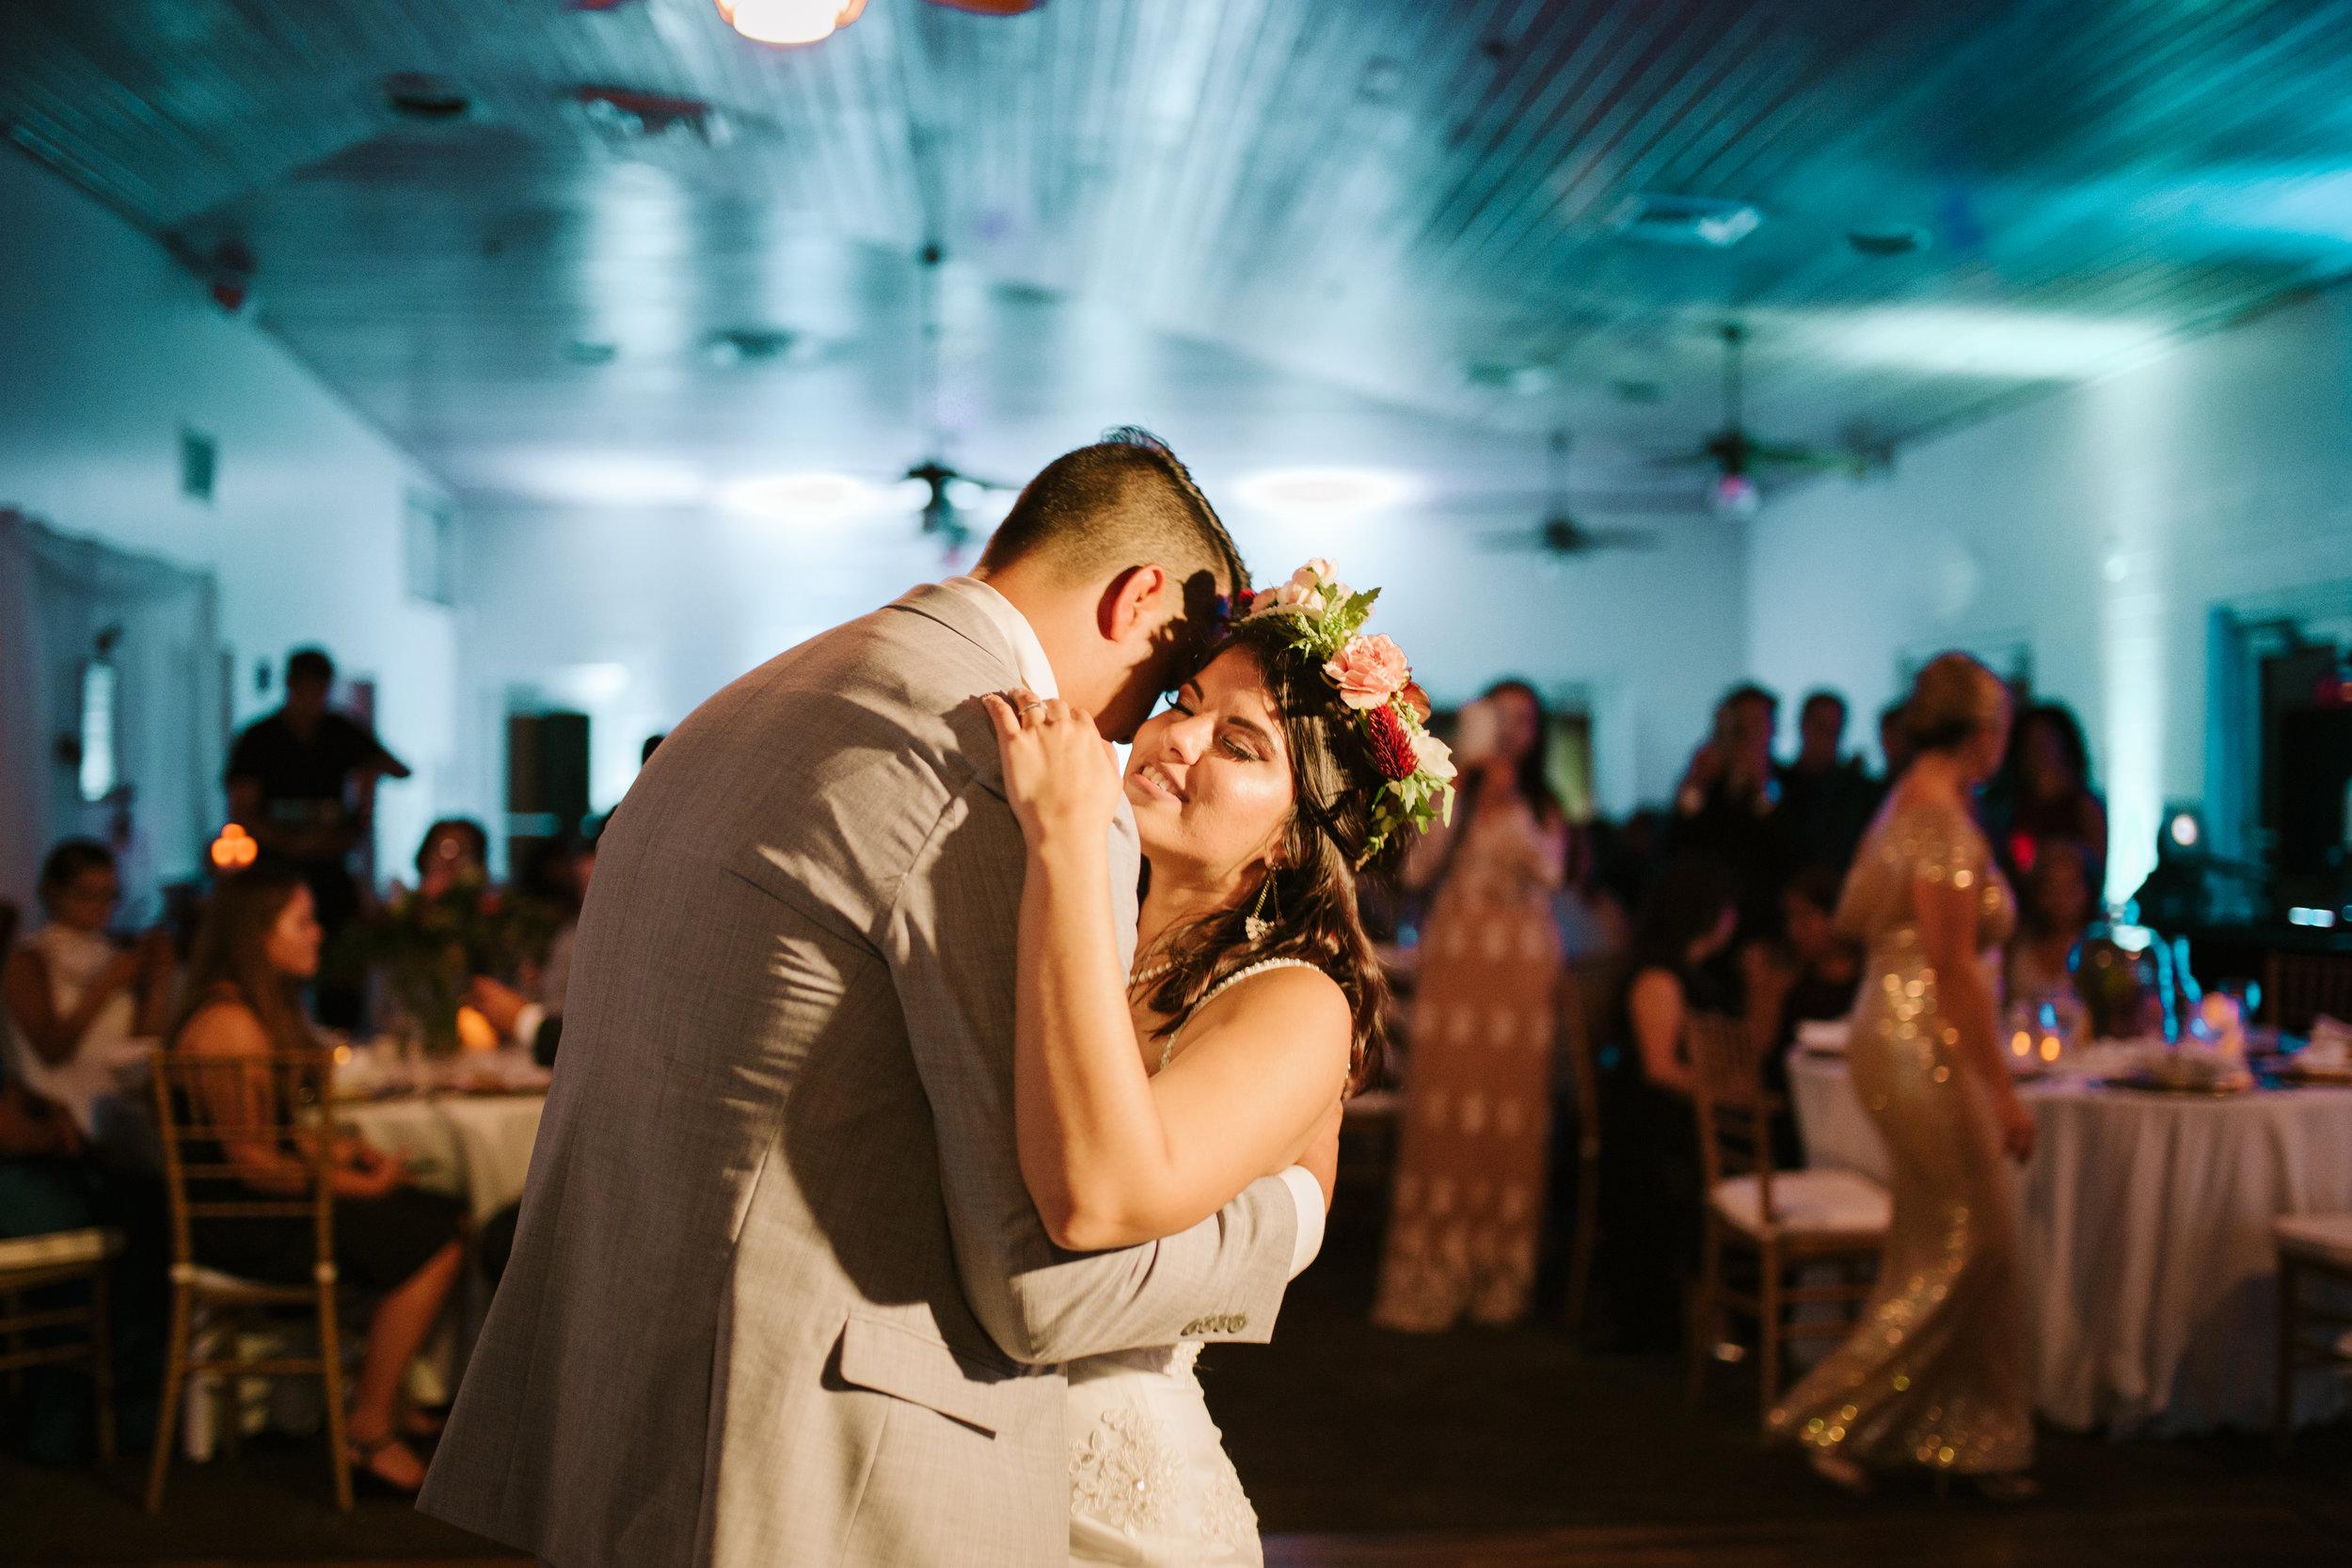 2017.05.23 Barbara and Mauricio Sales Port St Lucie Wedding (620 of 772).jpg